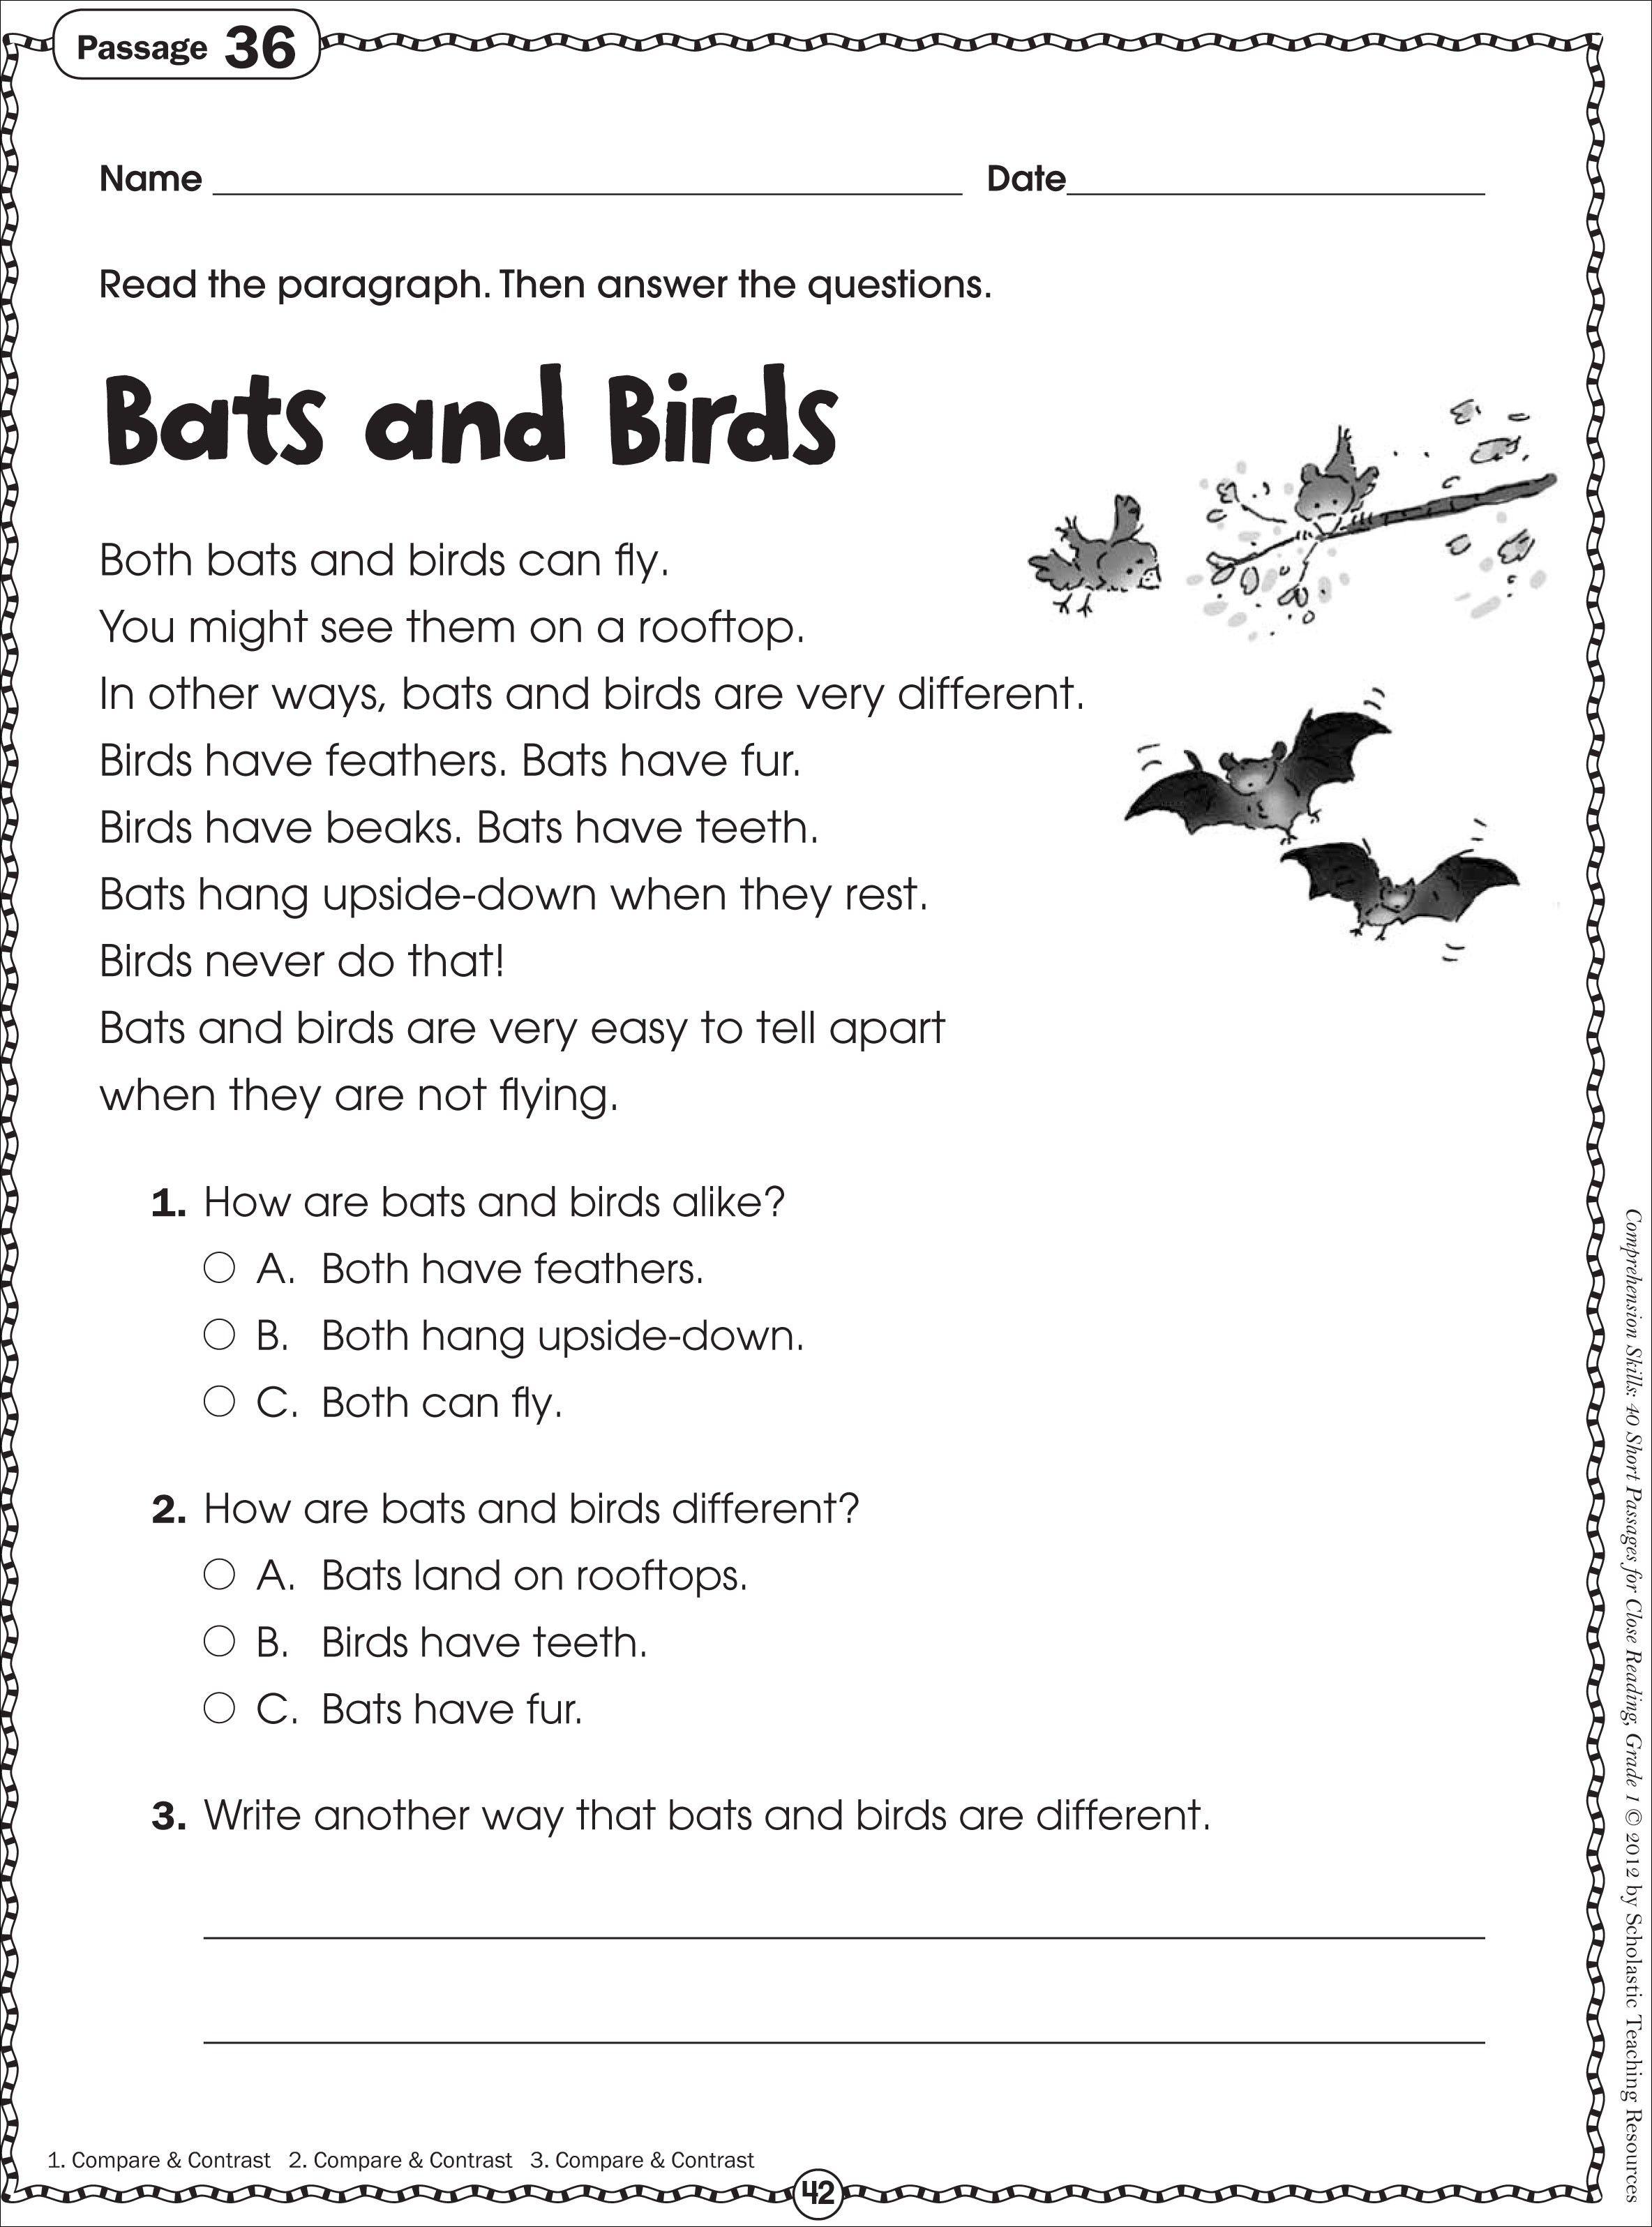 Free Printable Reading Comprehension Worksheets For Kindergarten - Free Printable Reading Comprehension Worksheets For Kindergarten